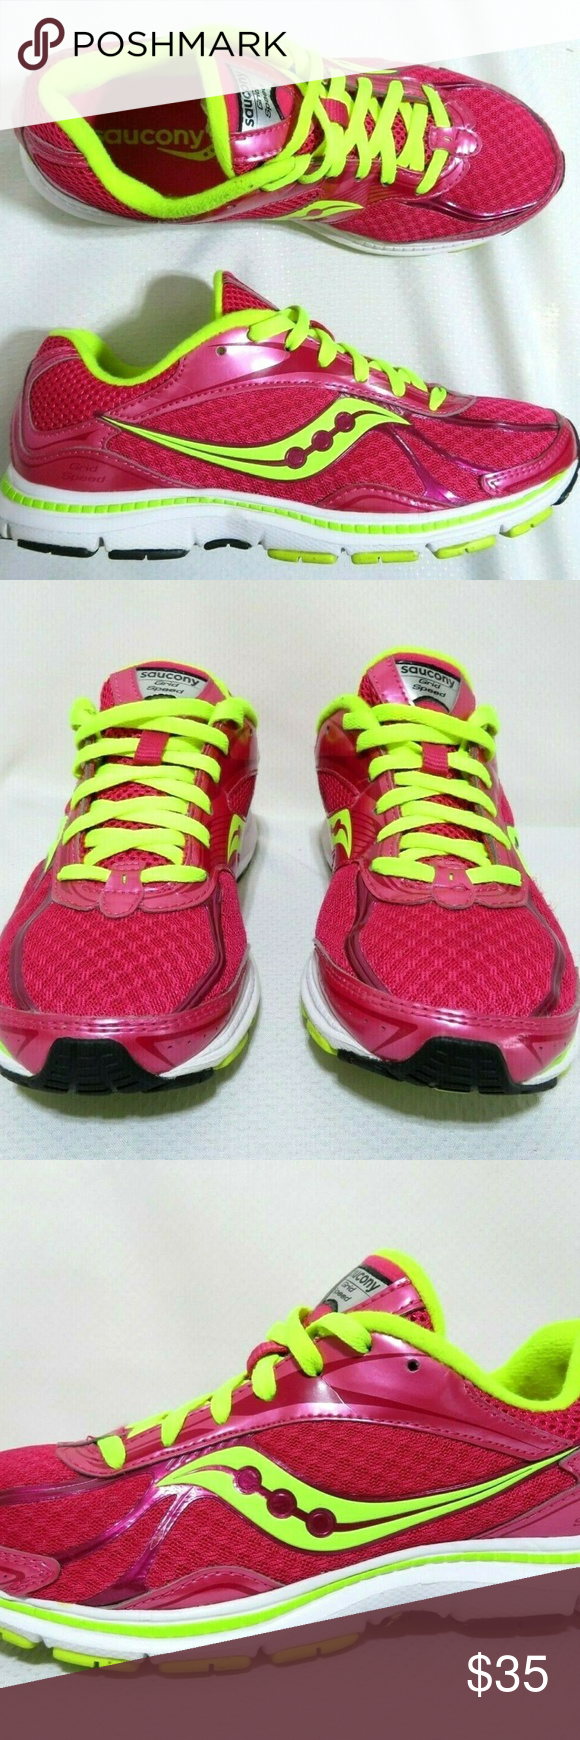 saucony xt 600 running chaussure